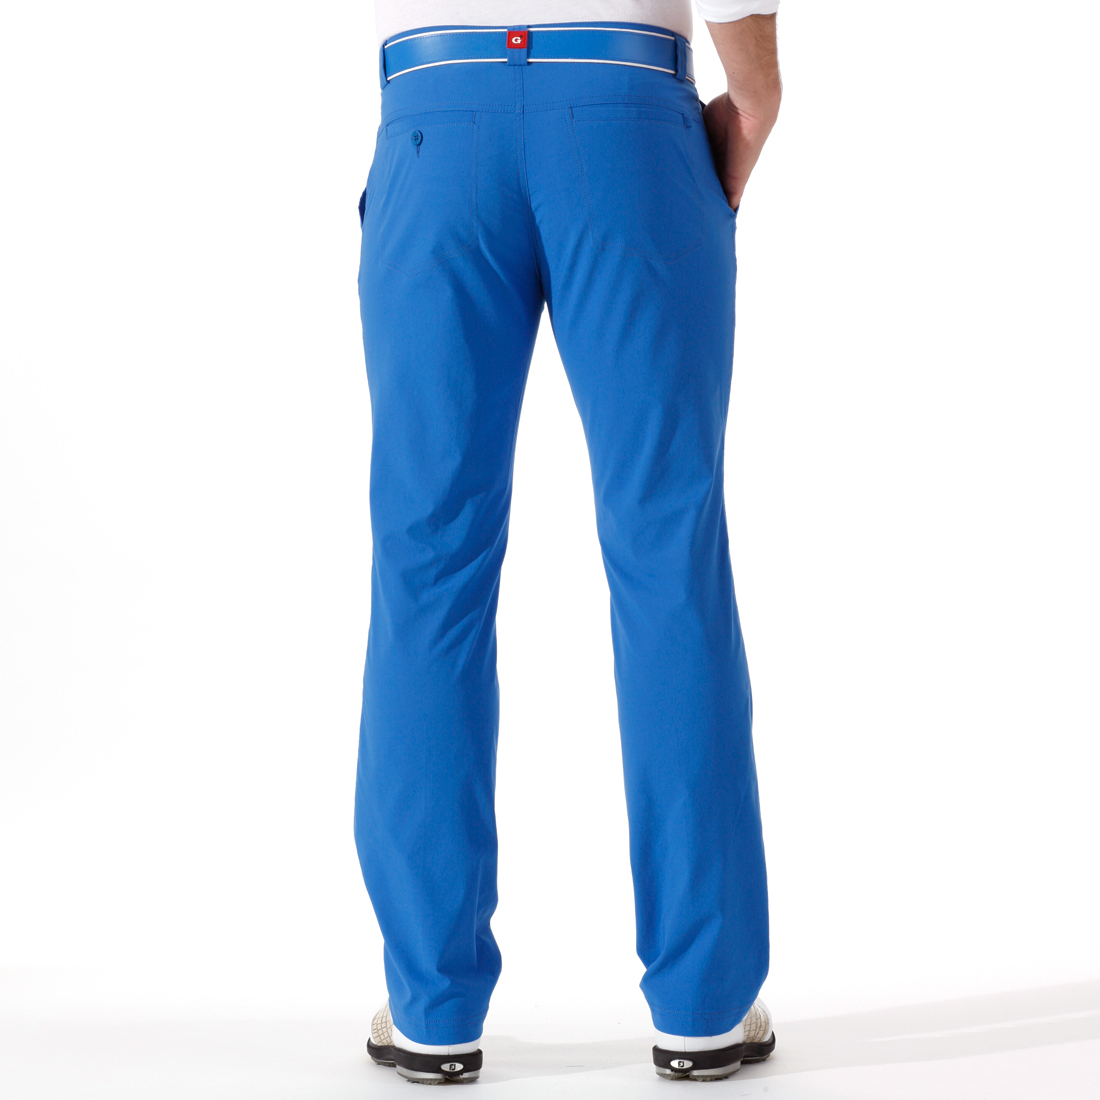 Techno Stretch Trousers